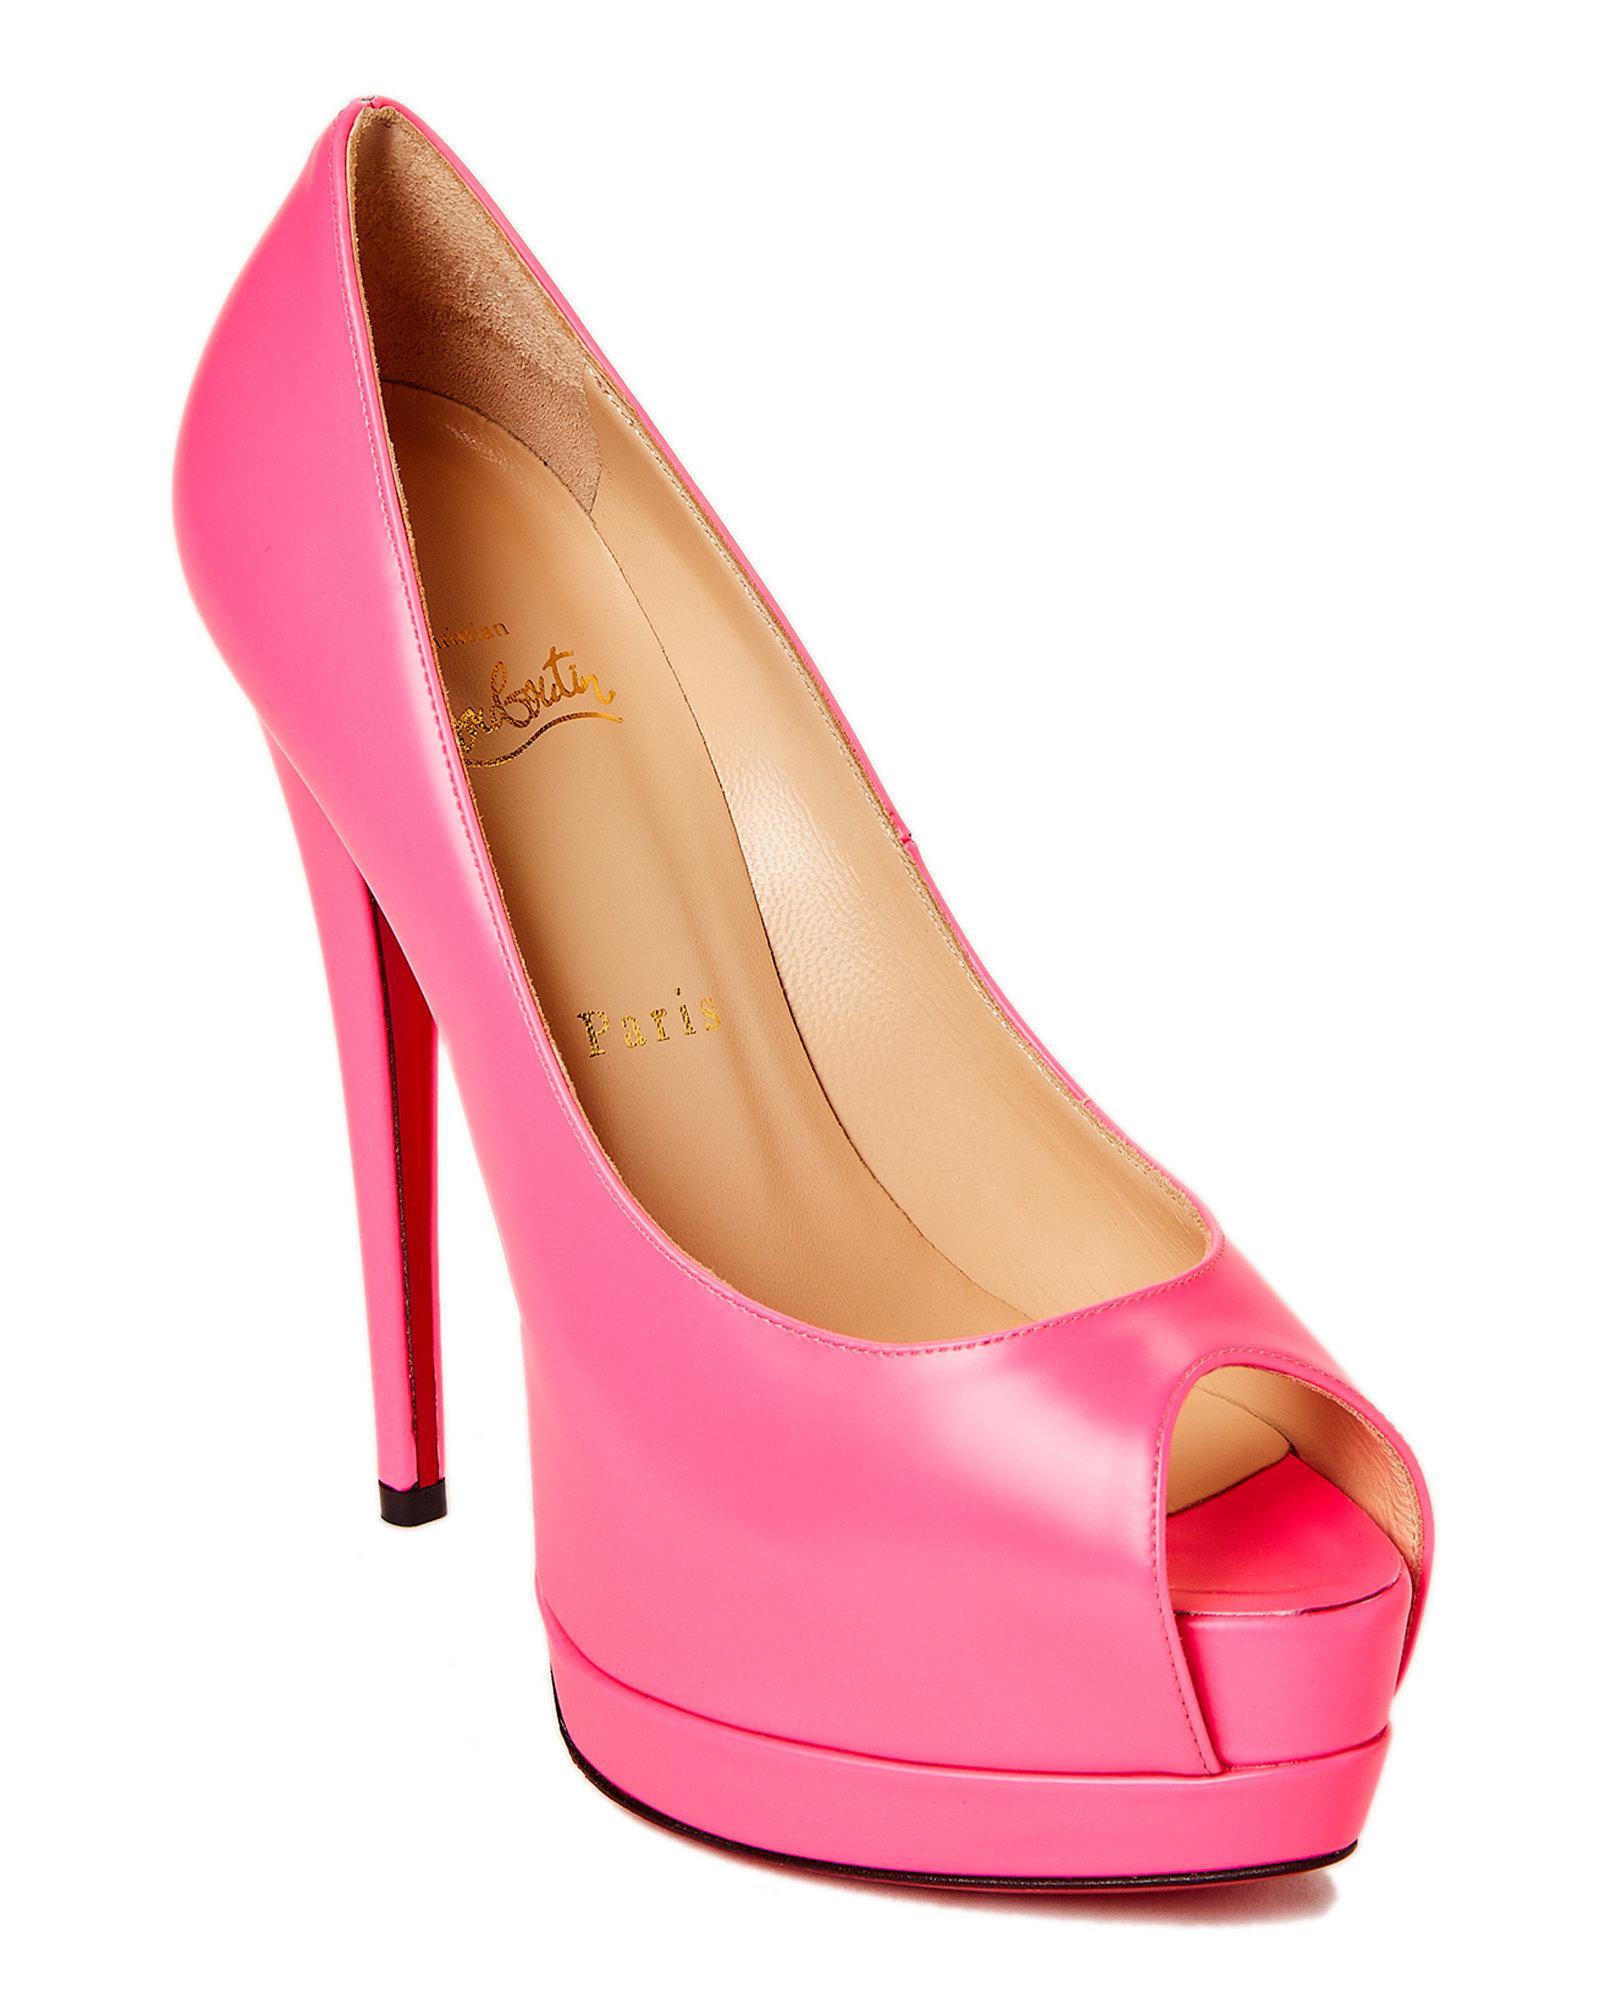 bf03faf62b55 Lyst - Christian Louboutin Palais Royal Peep Toe Platform Pumps in Pink